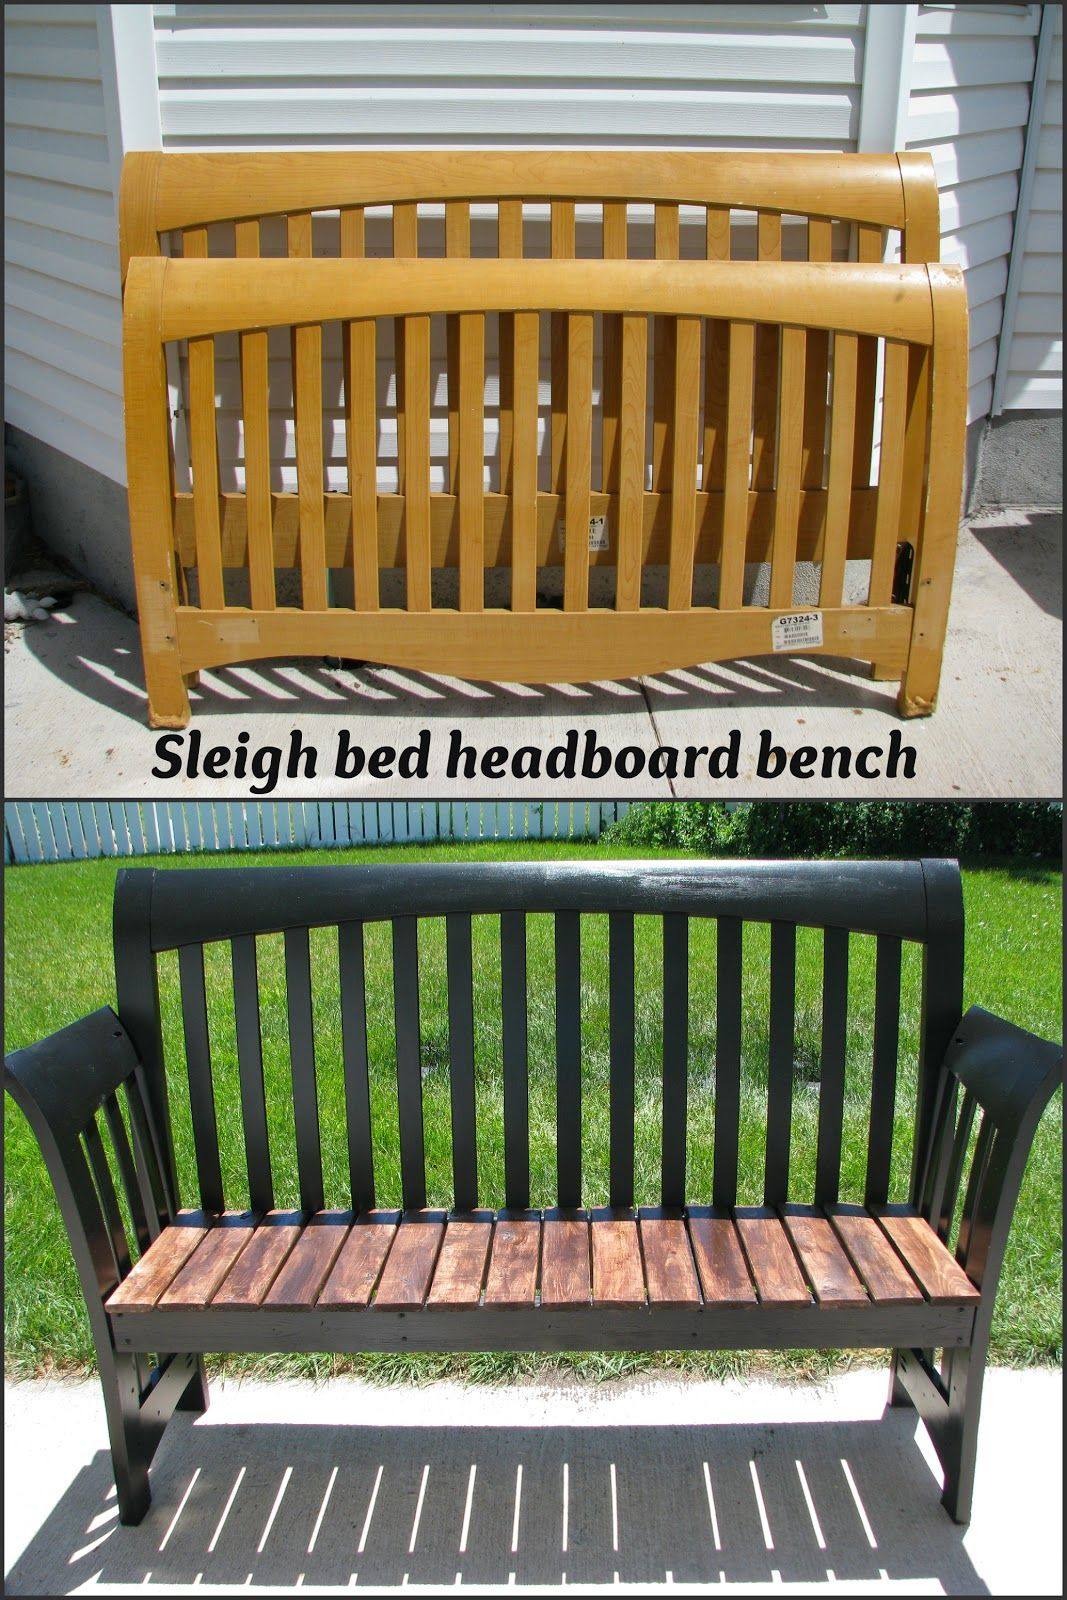 Headboard Bench Plans My So Called Diy Blog Sleigh Bed Headboard Bench Diy Furniture